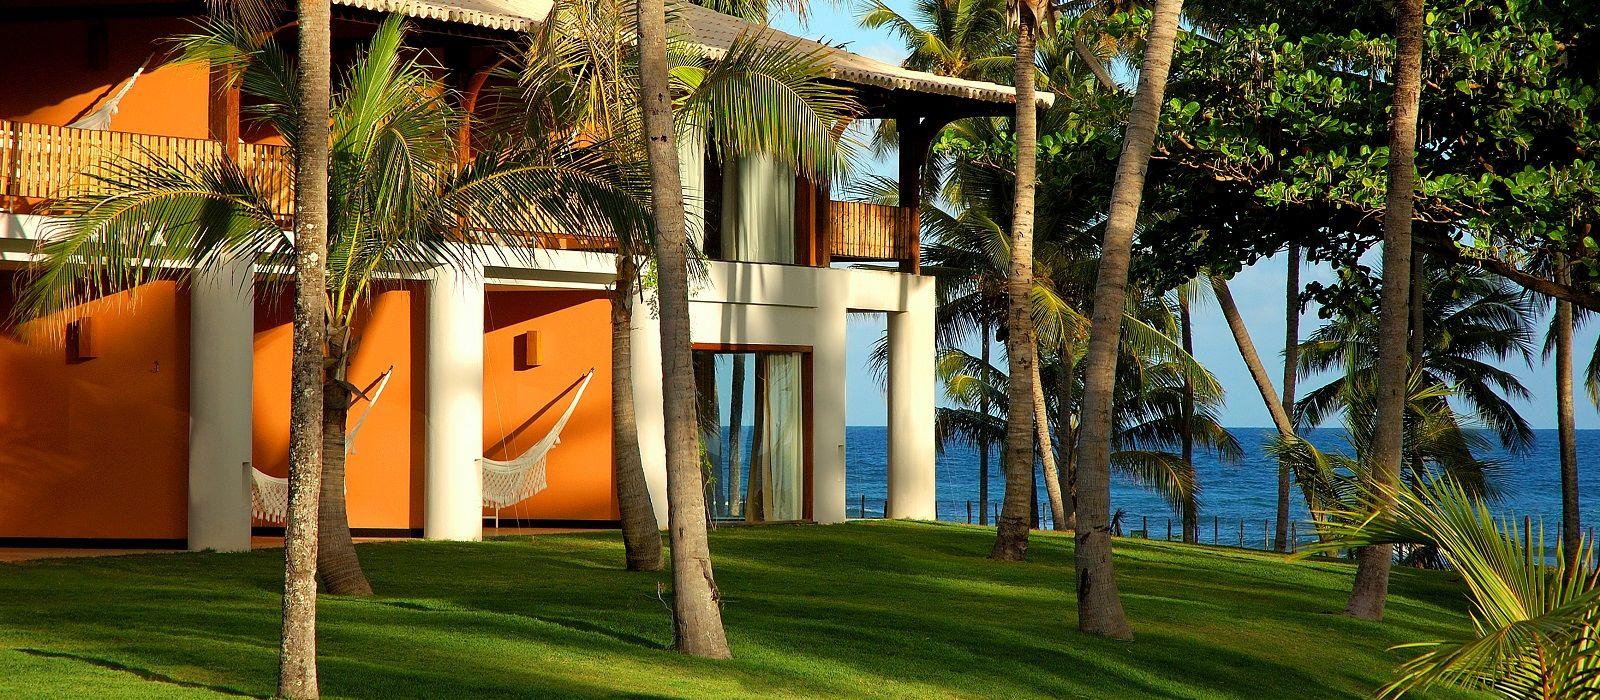 Hotel Tivoli Ecoresort Praia do Forte Brazil